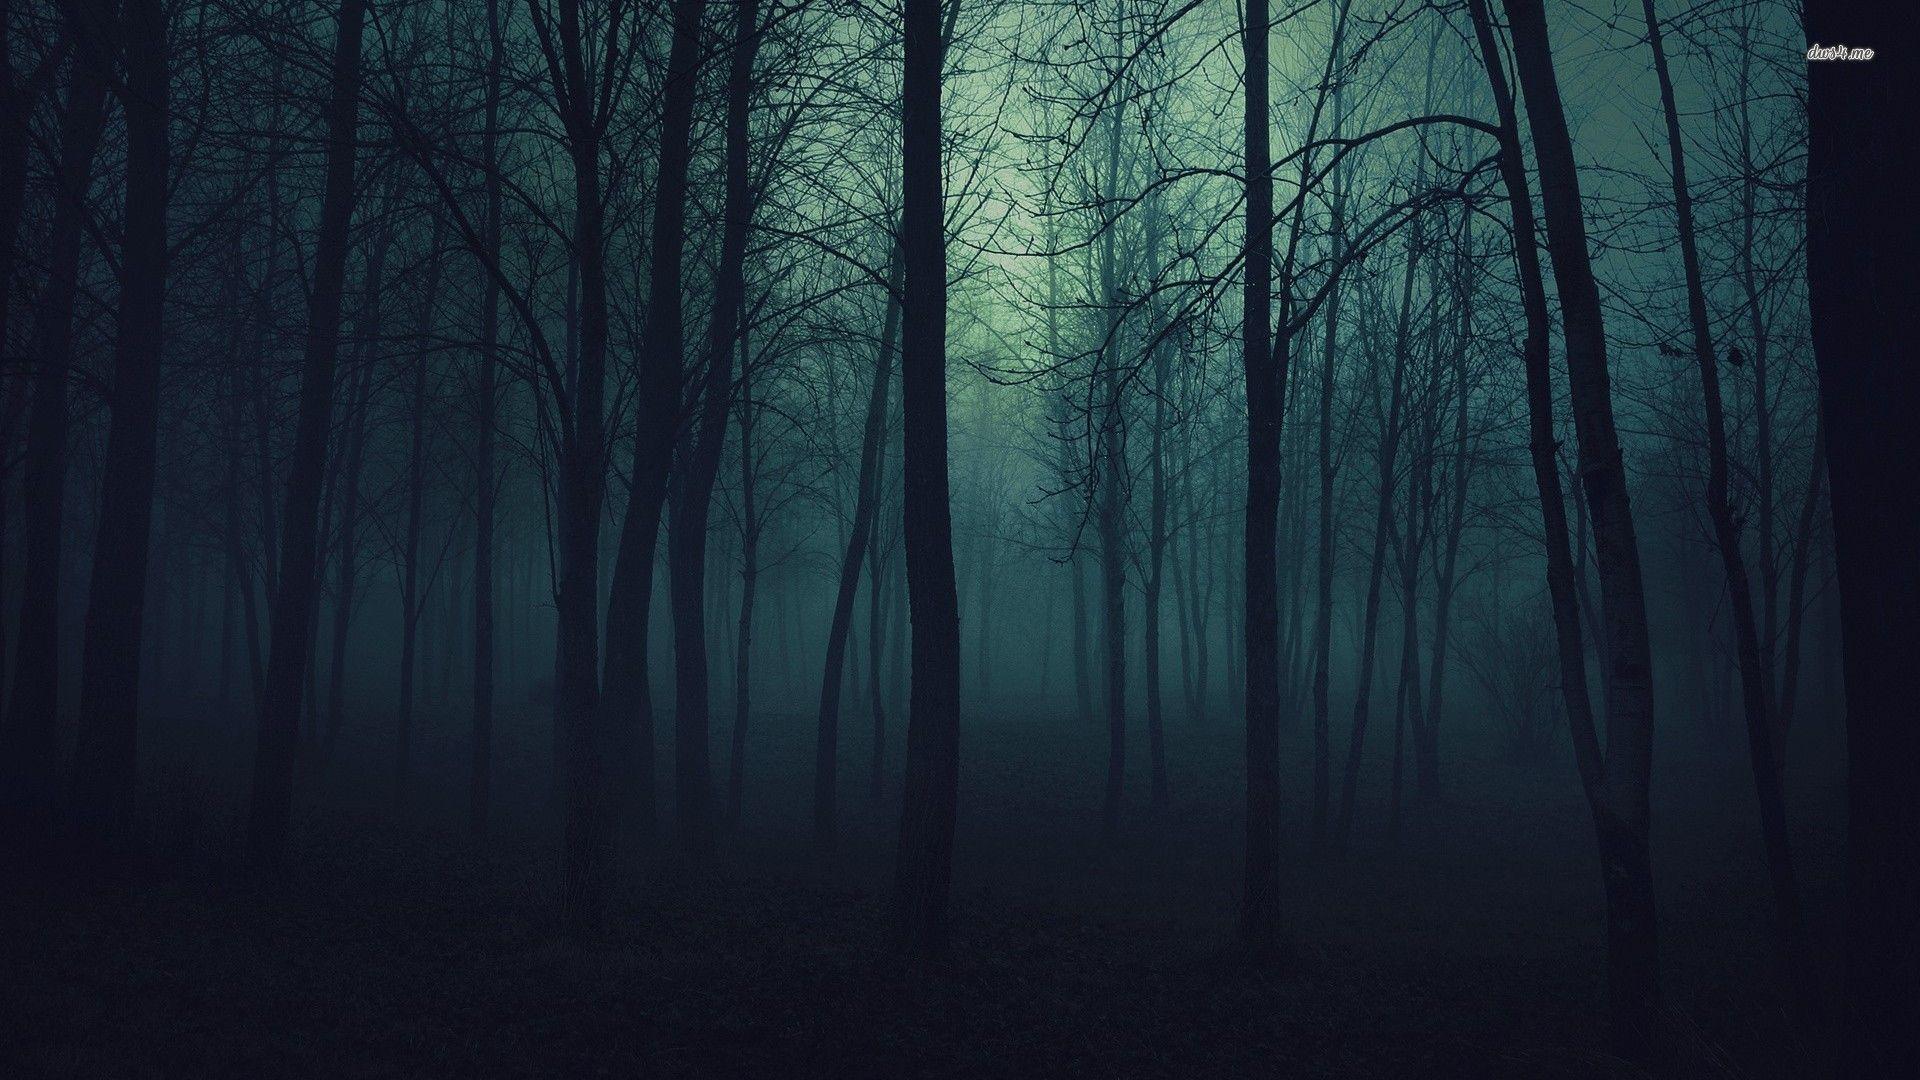 dark forest wallpaper hd wallpapersafari